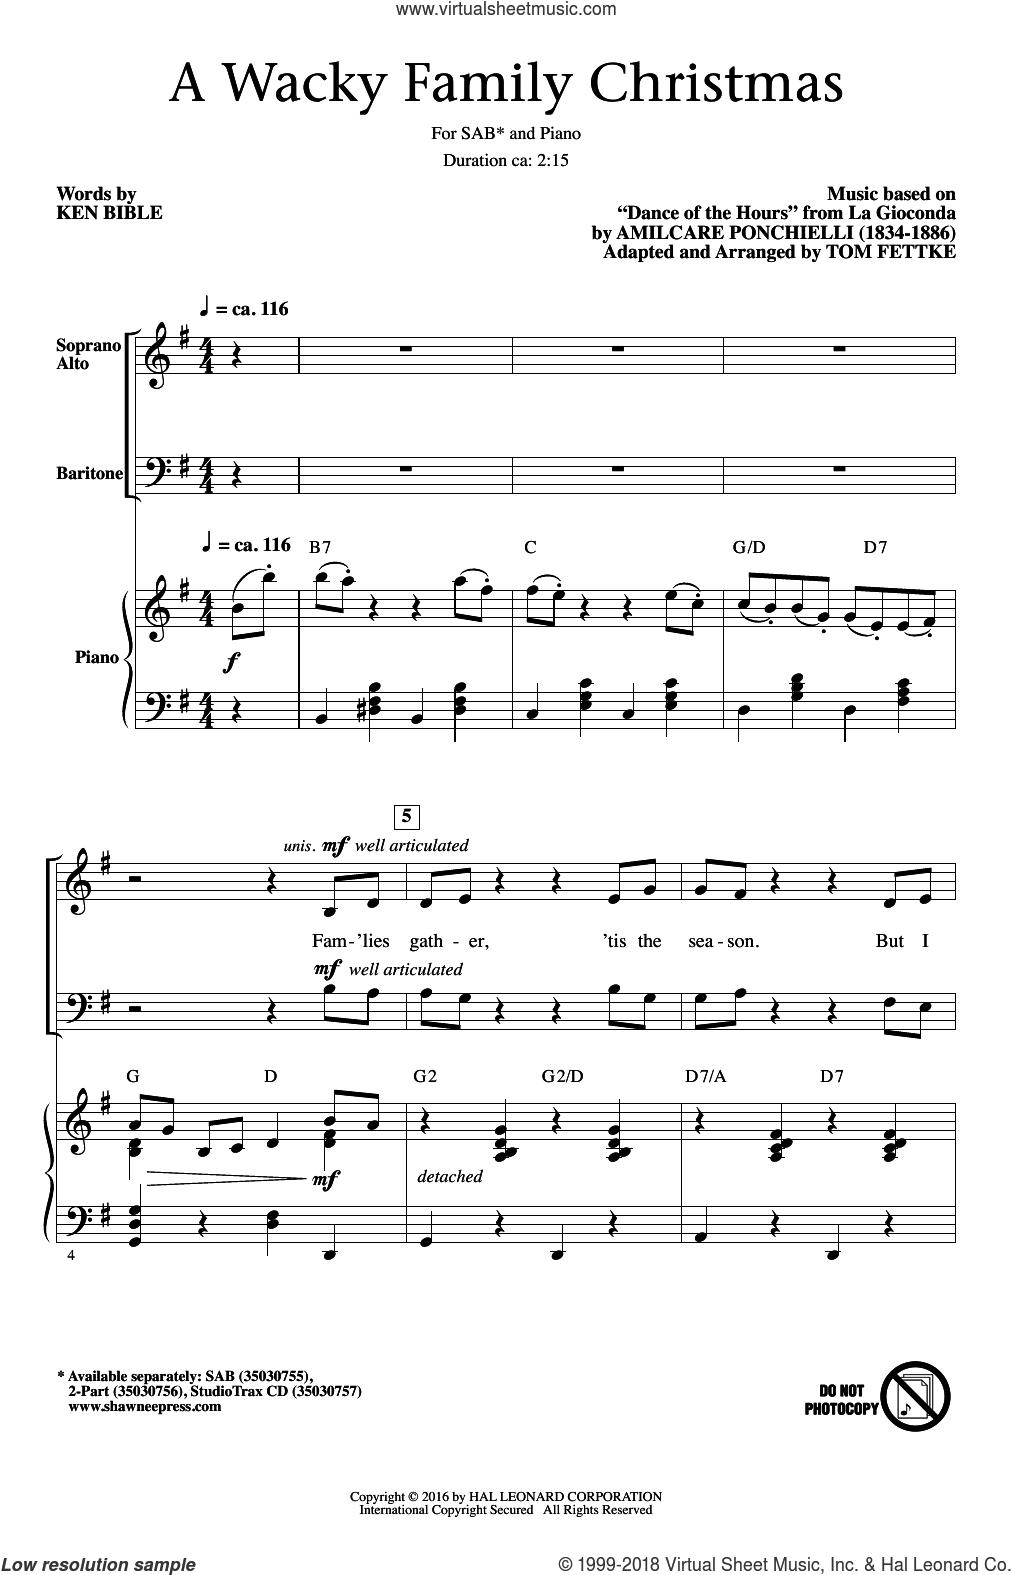 A Wacky Family Christmas sheet music for choir (SAB: soprano, alto, bass) by Amilcare Ponchielli, Tom Fettke and Ken Bible, intermediate skill level